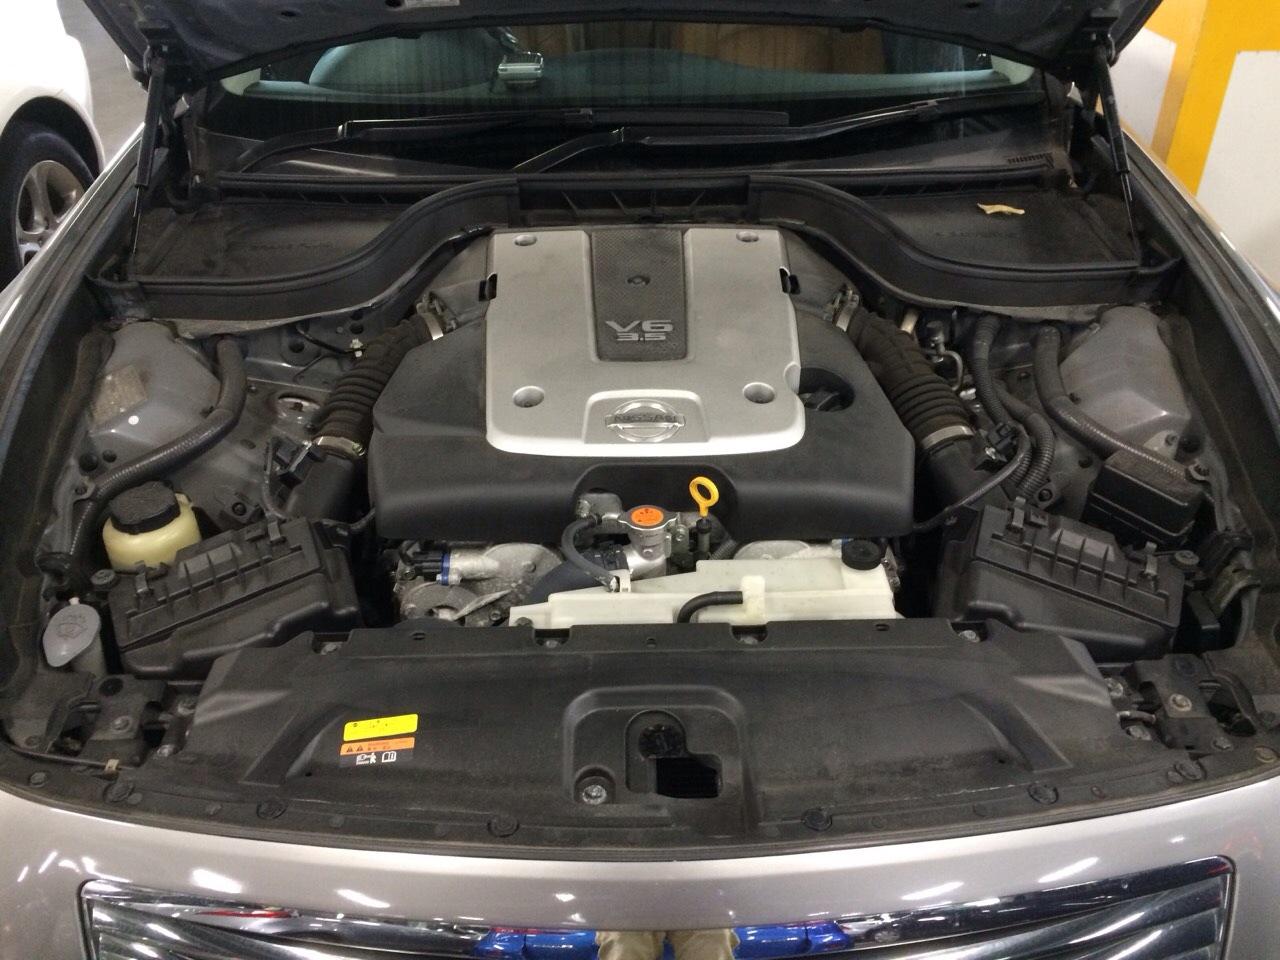 2007 Nissan Skyline V36 sedan 350GT Type SP engine